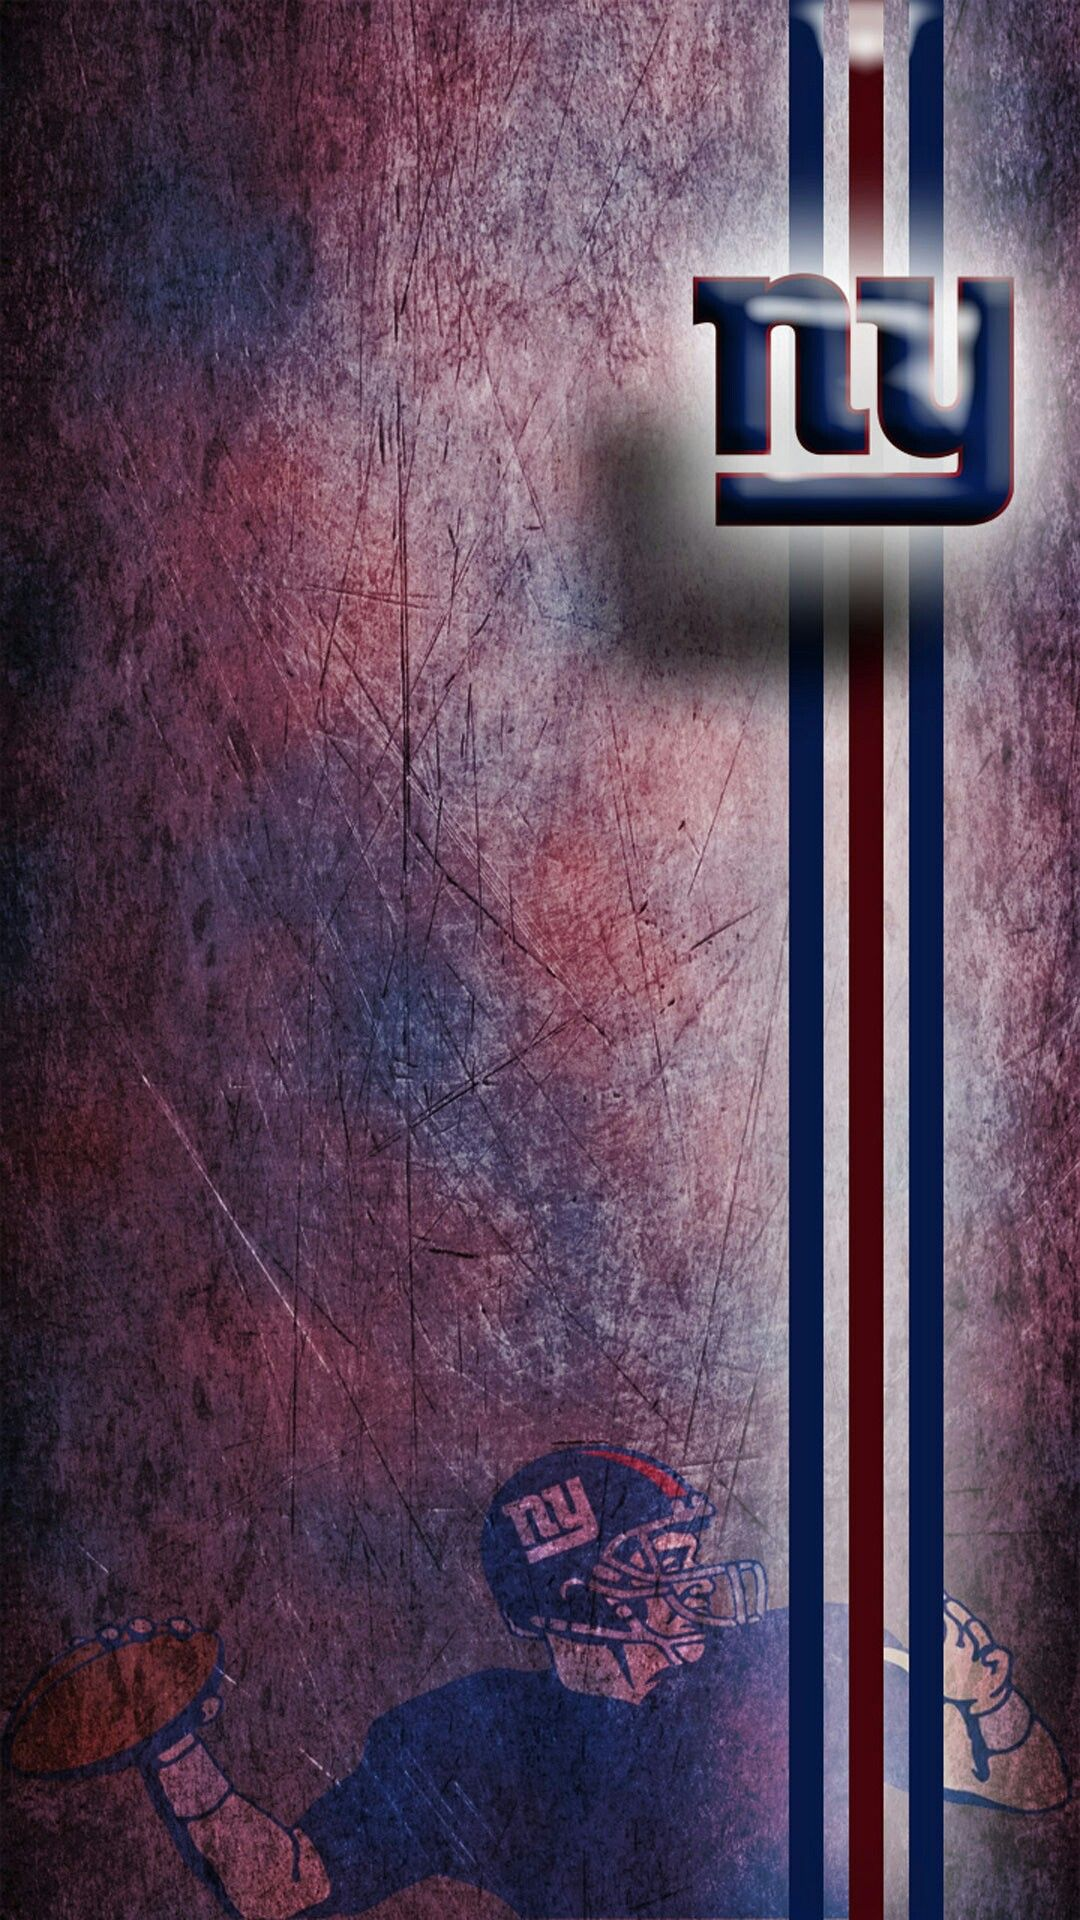 New York Giants wallpaper. | New York Giants | Pinterest | American football, Champion and Sport ...